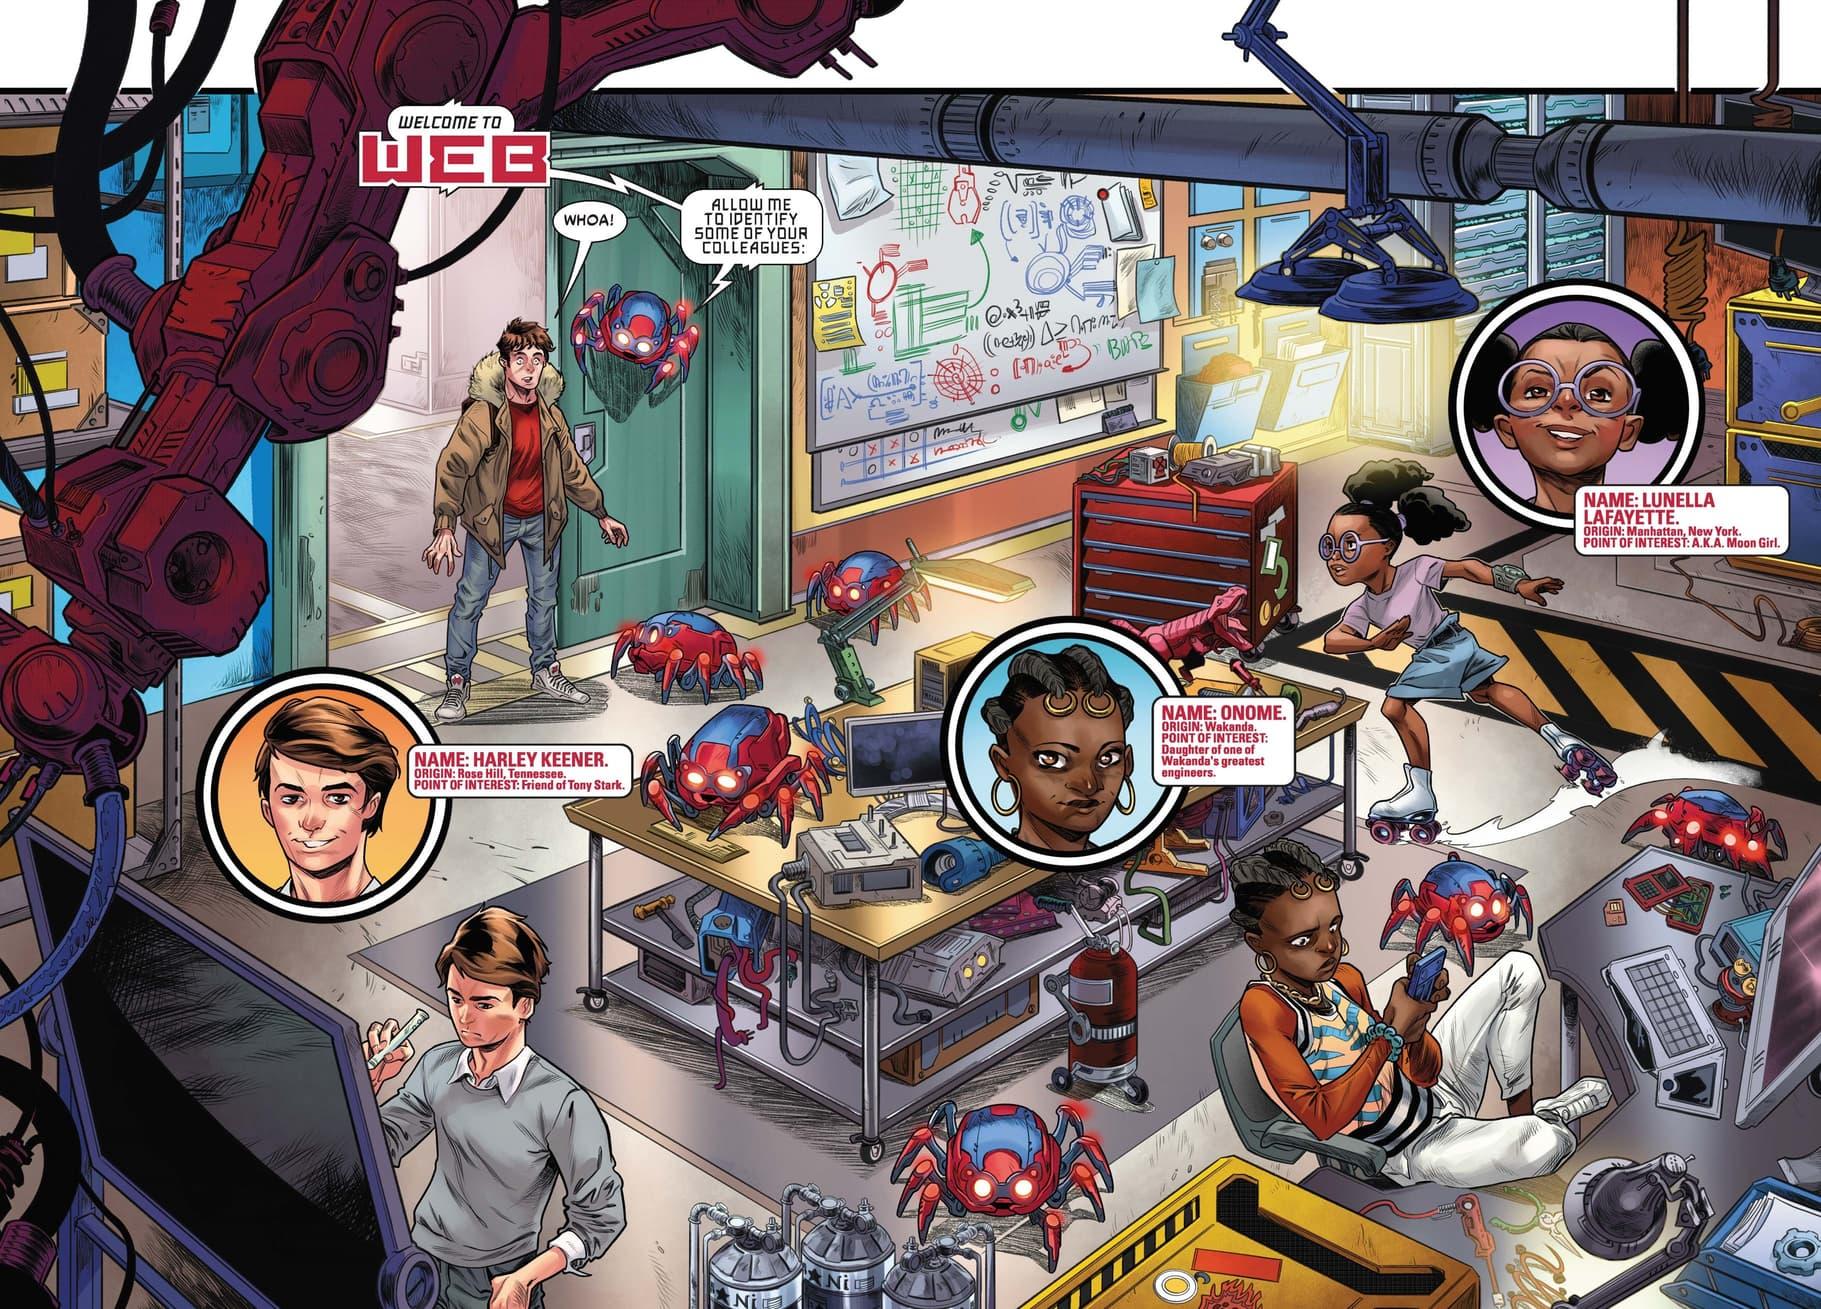 Meet the students of W.E.B. in W.E.B. OF SPIDER-MAN (2021) #1.